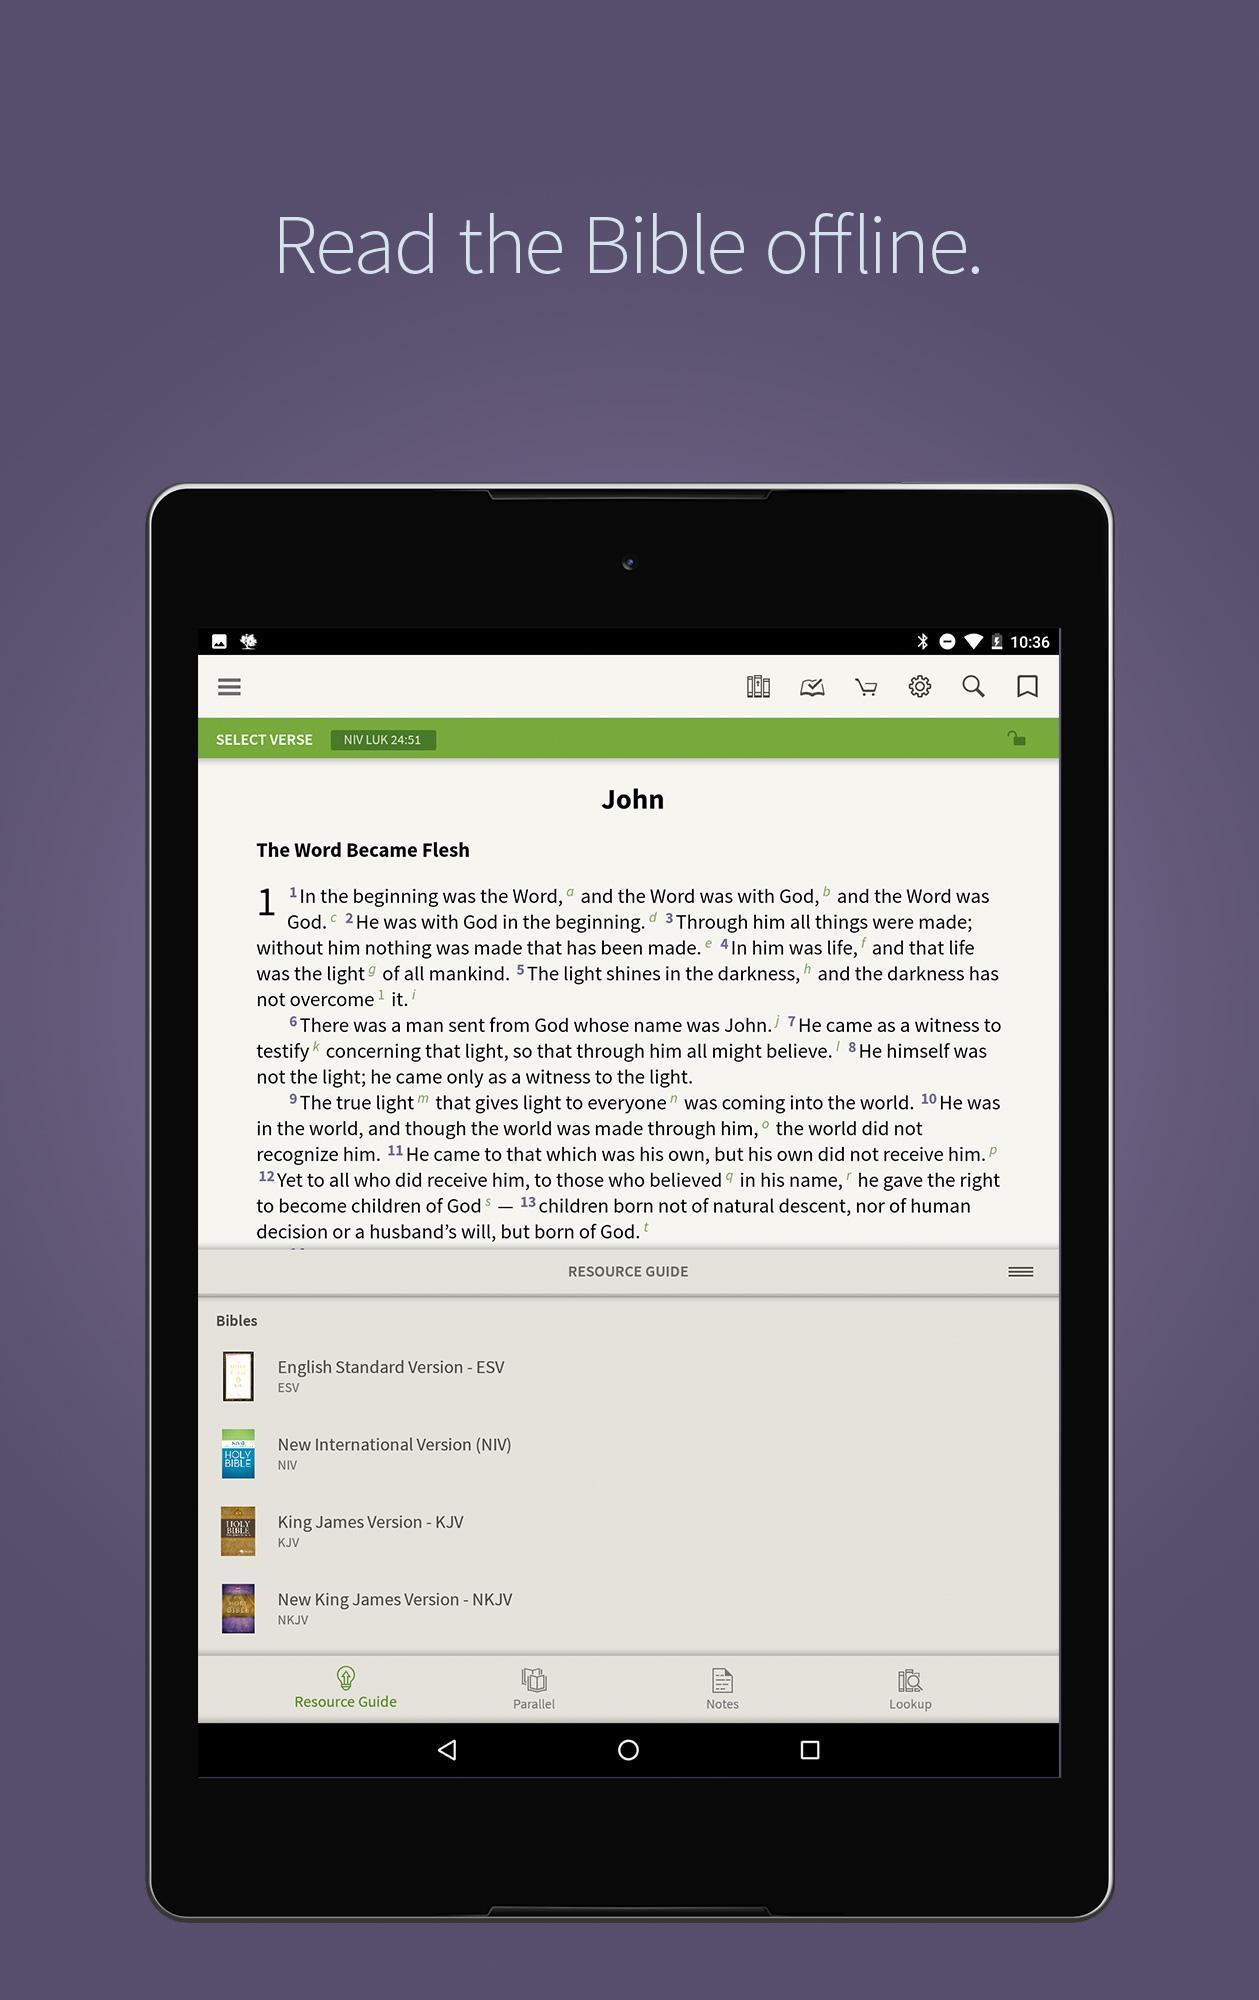 Bible App by Olive Tree 7.5.4.0.5664 Screenshot 17